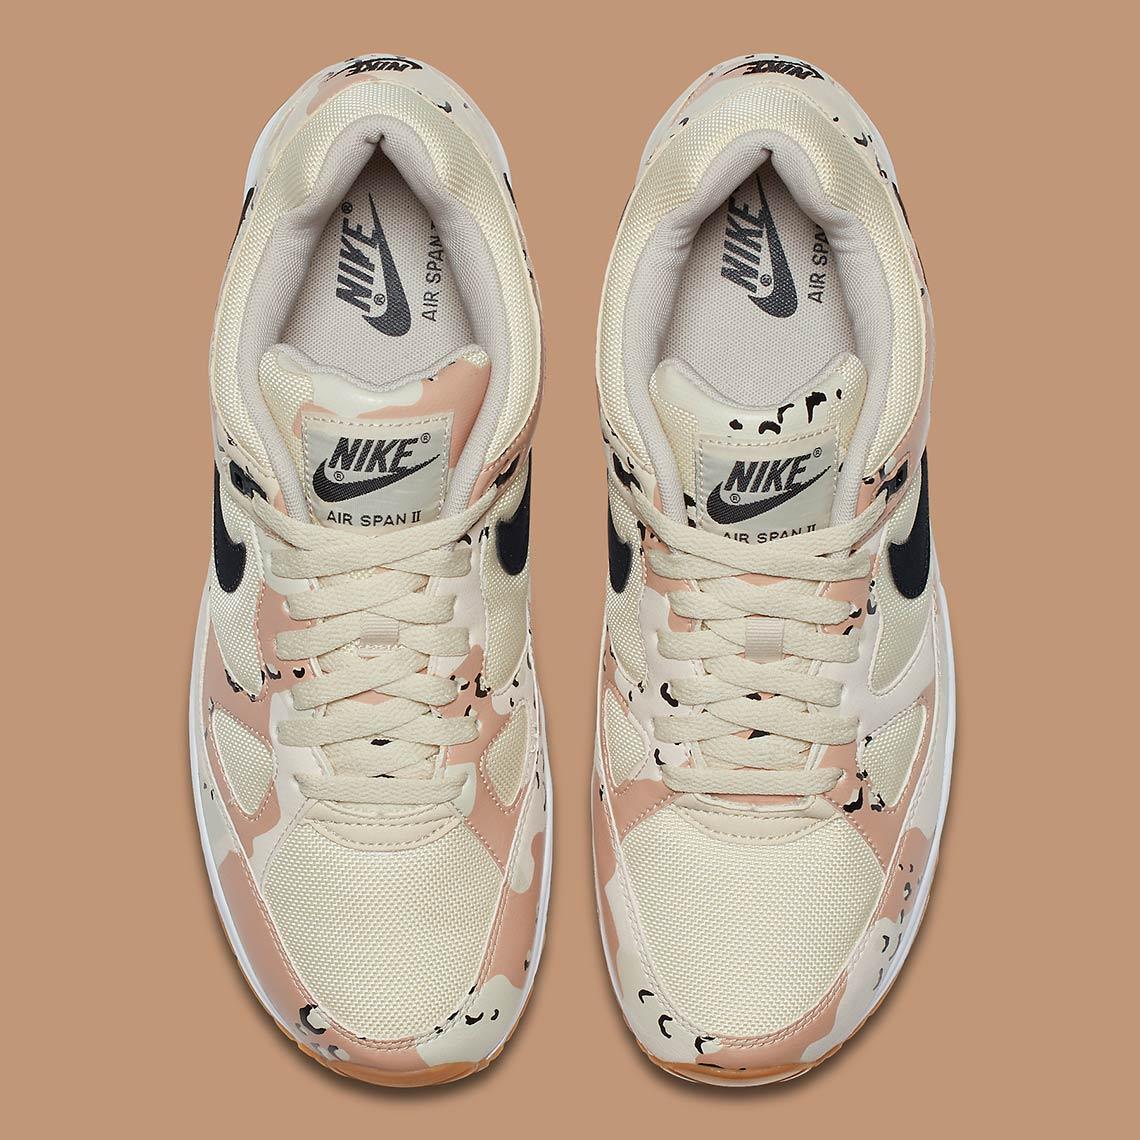 cheap for discount e2899 b7cd9 Nike Air Span II Desert Camo AO1546-200 Available Now   SneakerNews.com